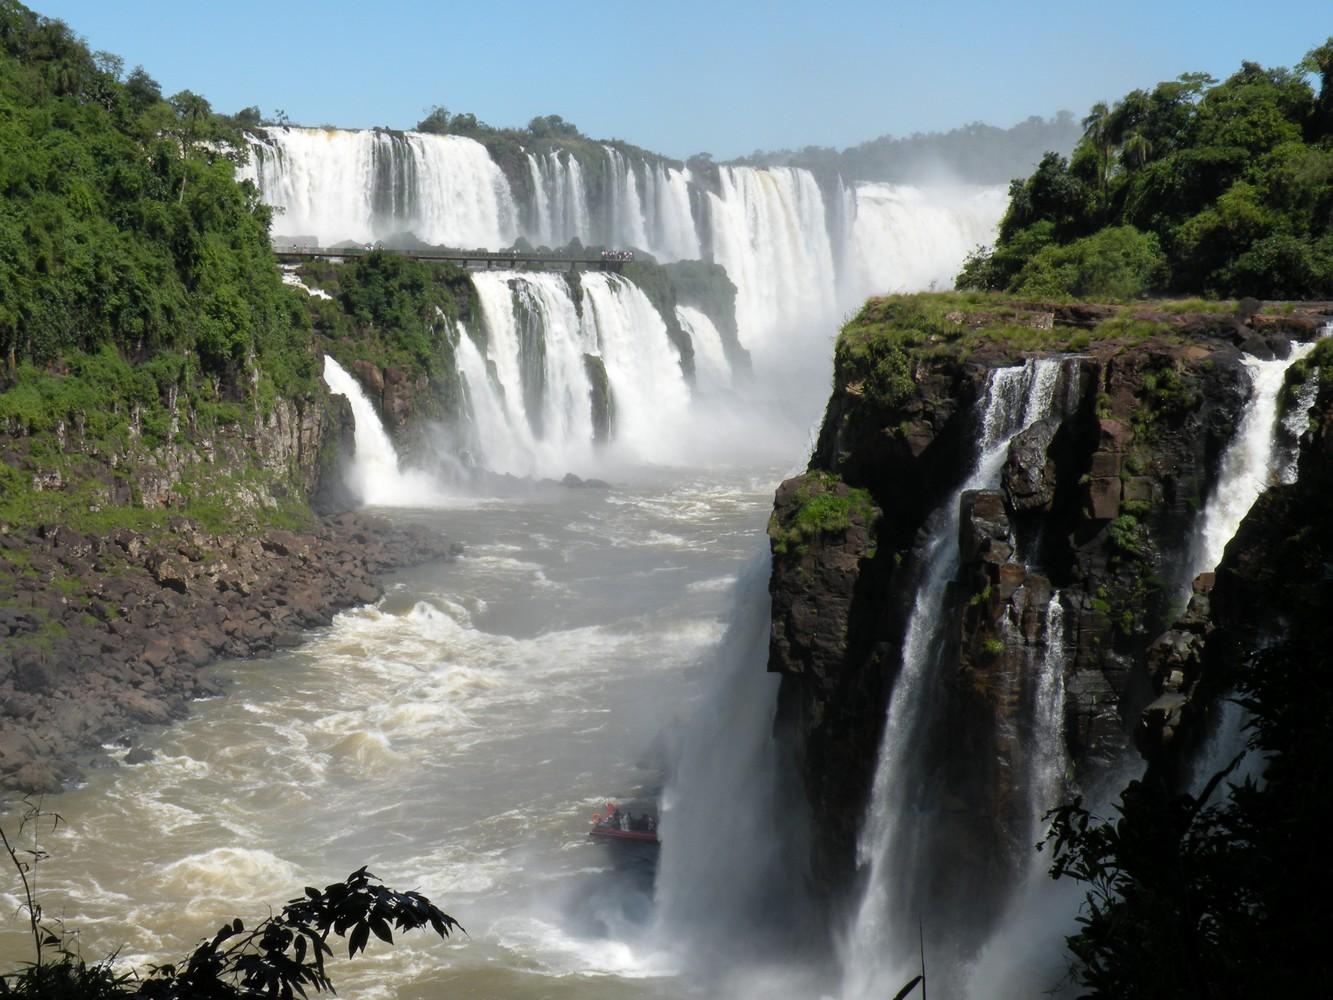 Isla San Martin - Parque Nacional Iguazú